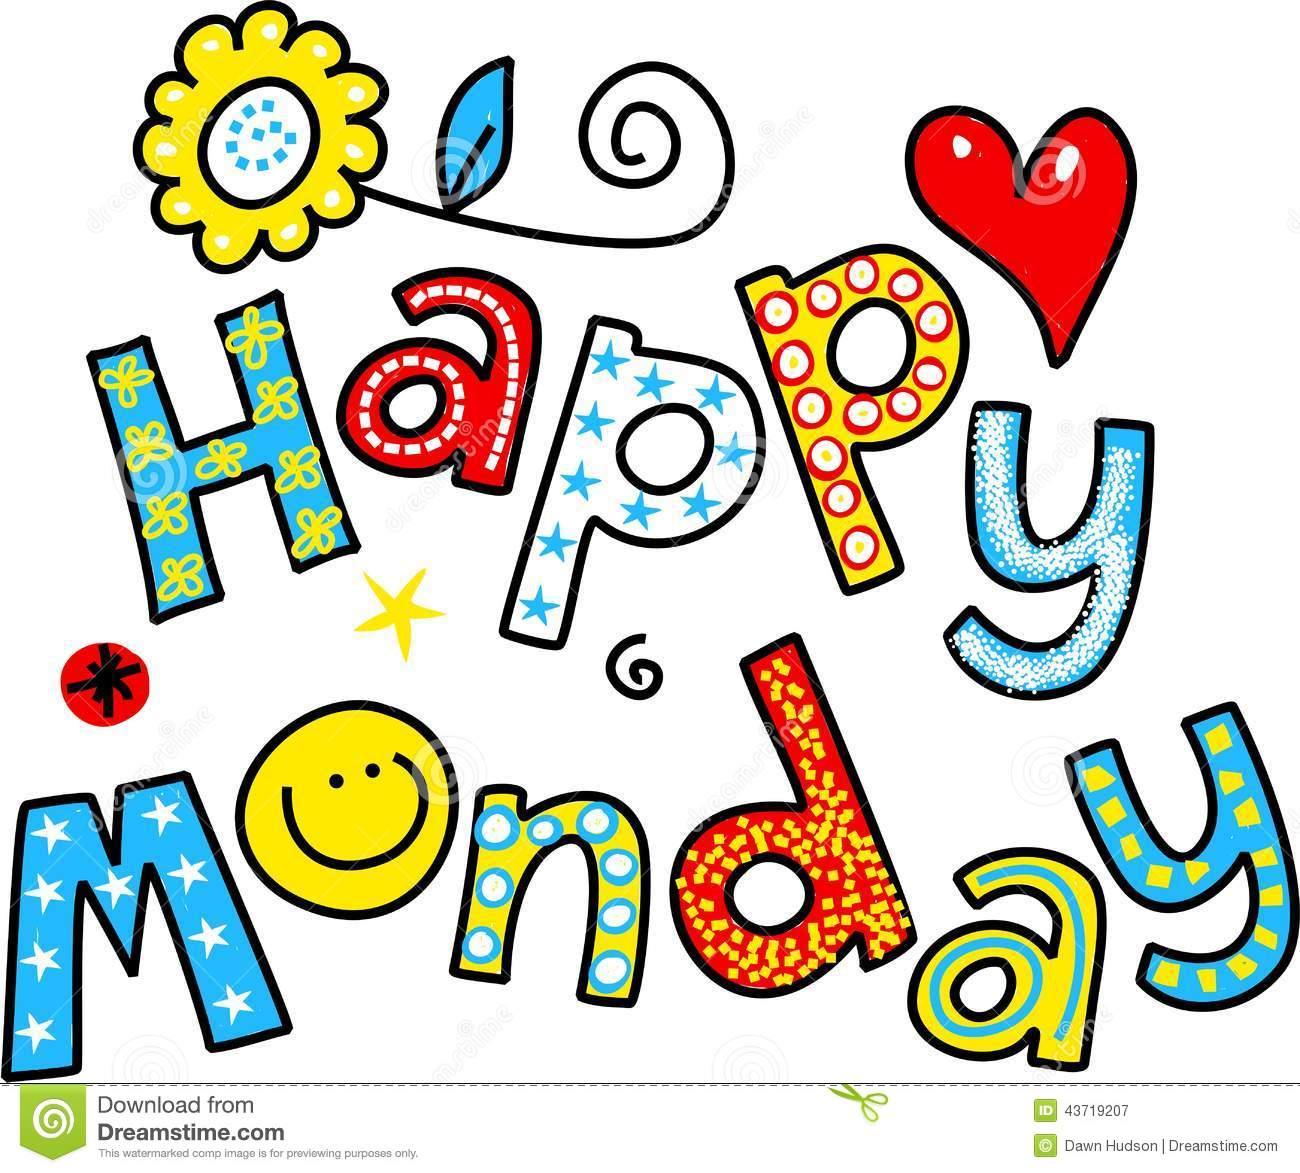 Happy Monday Cartoon Text Clipart Stock Illustration Image 43719207